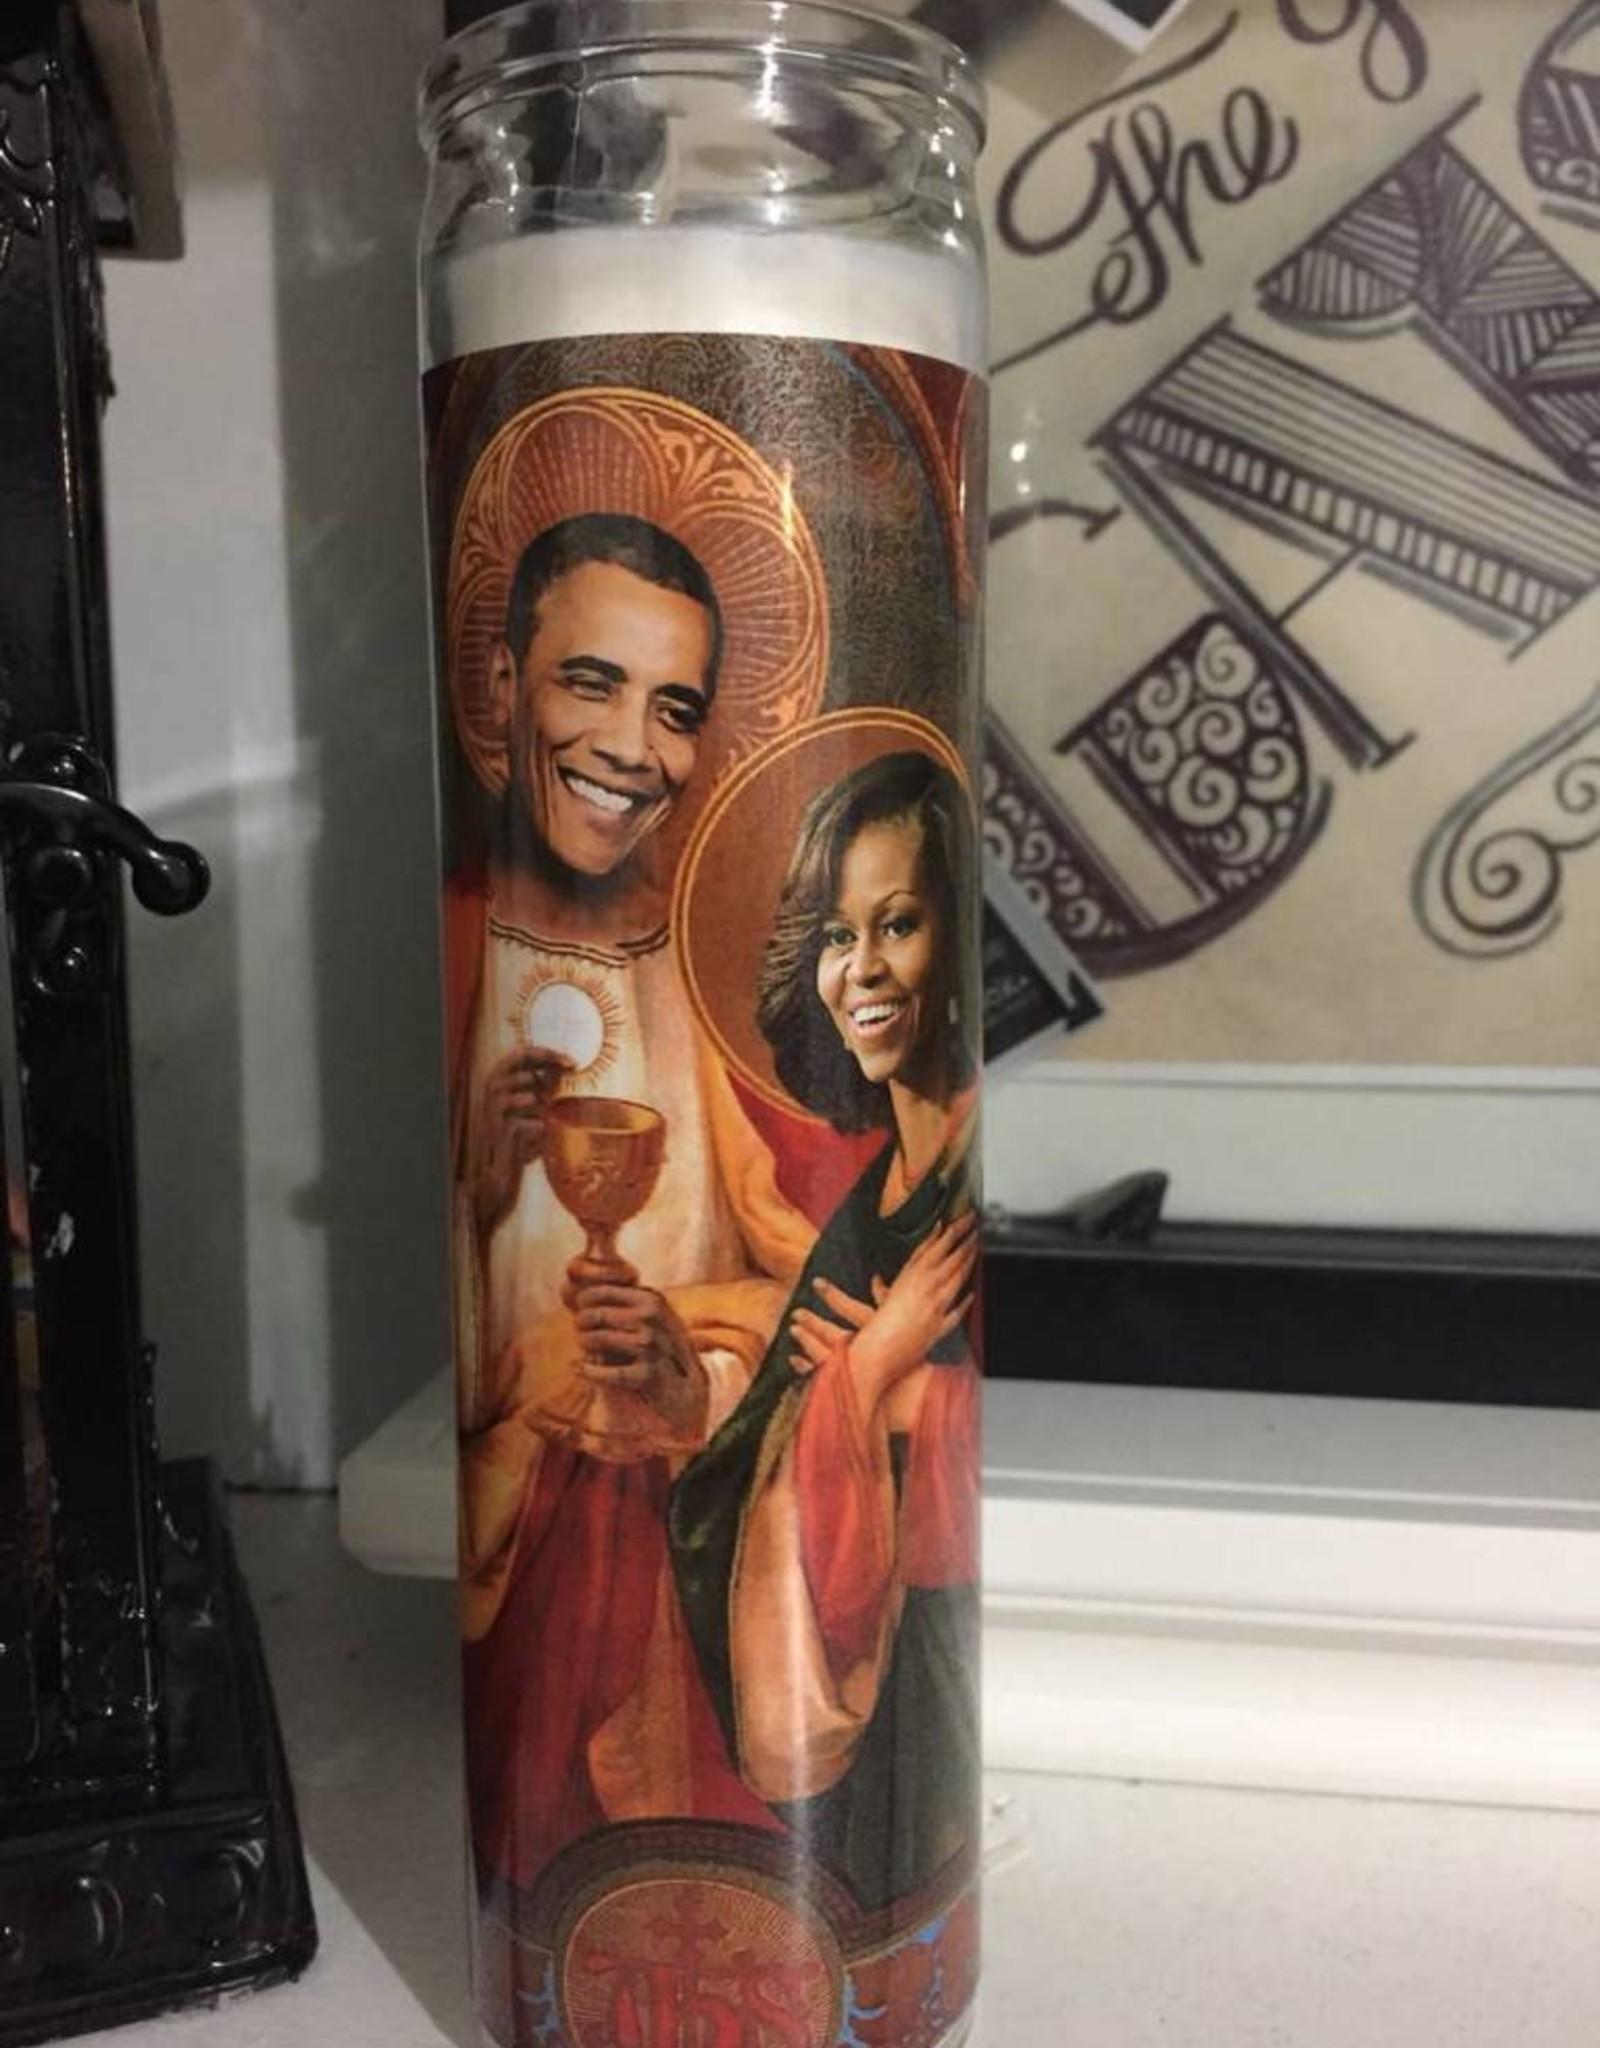 Michelle & Barack Obama Prayer Candle